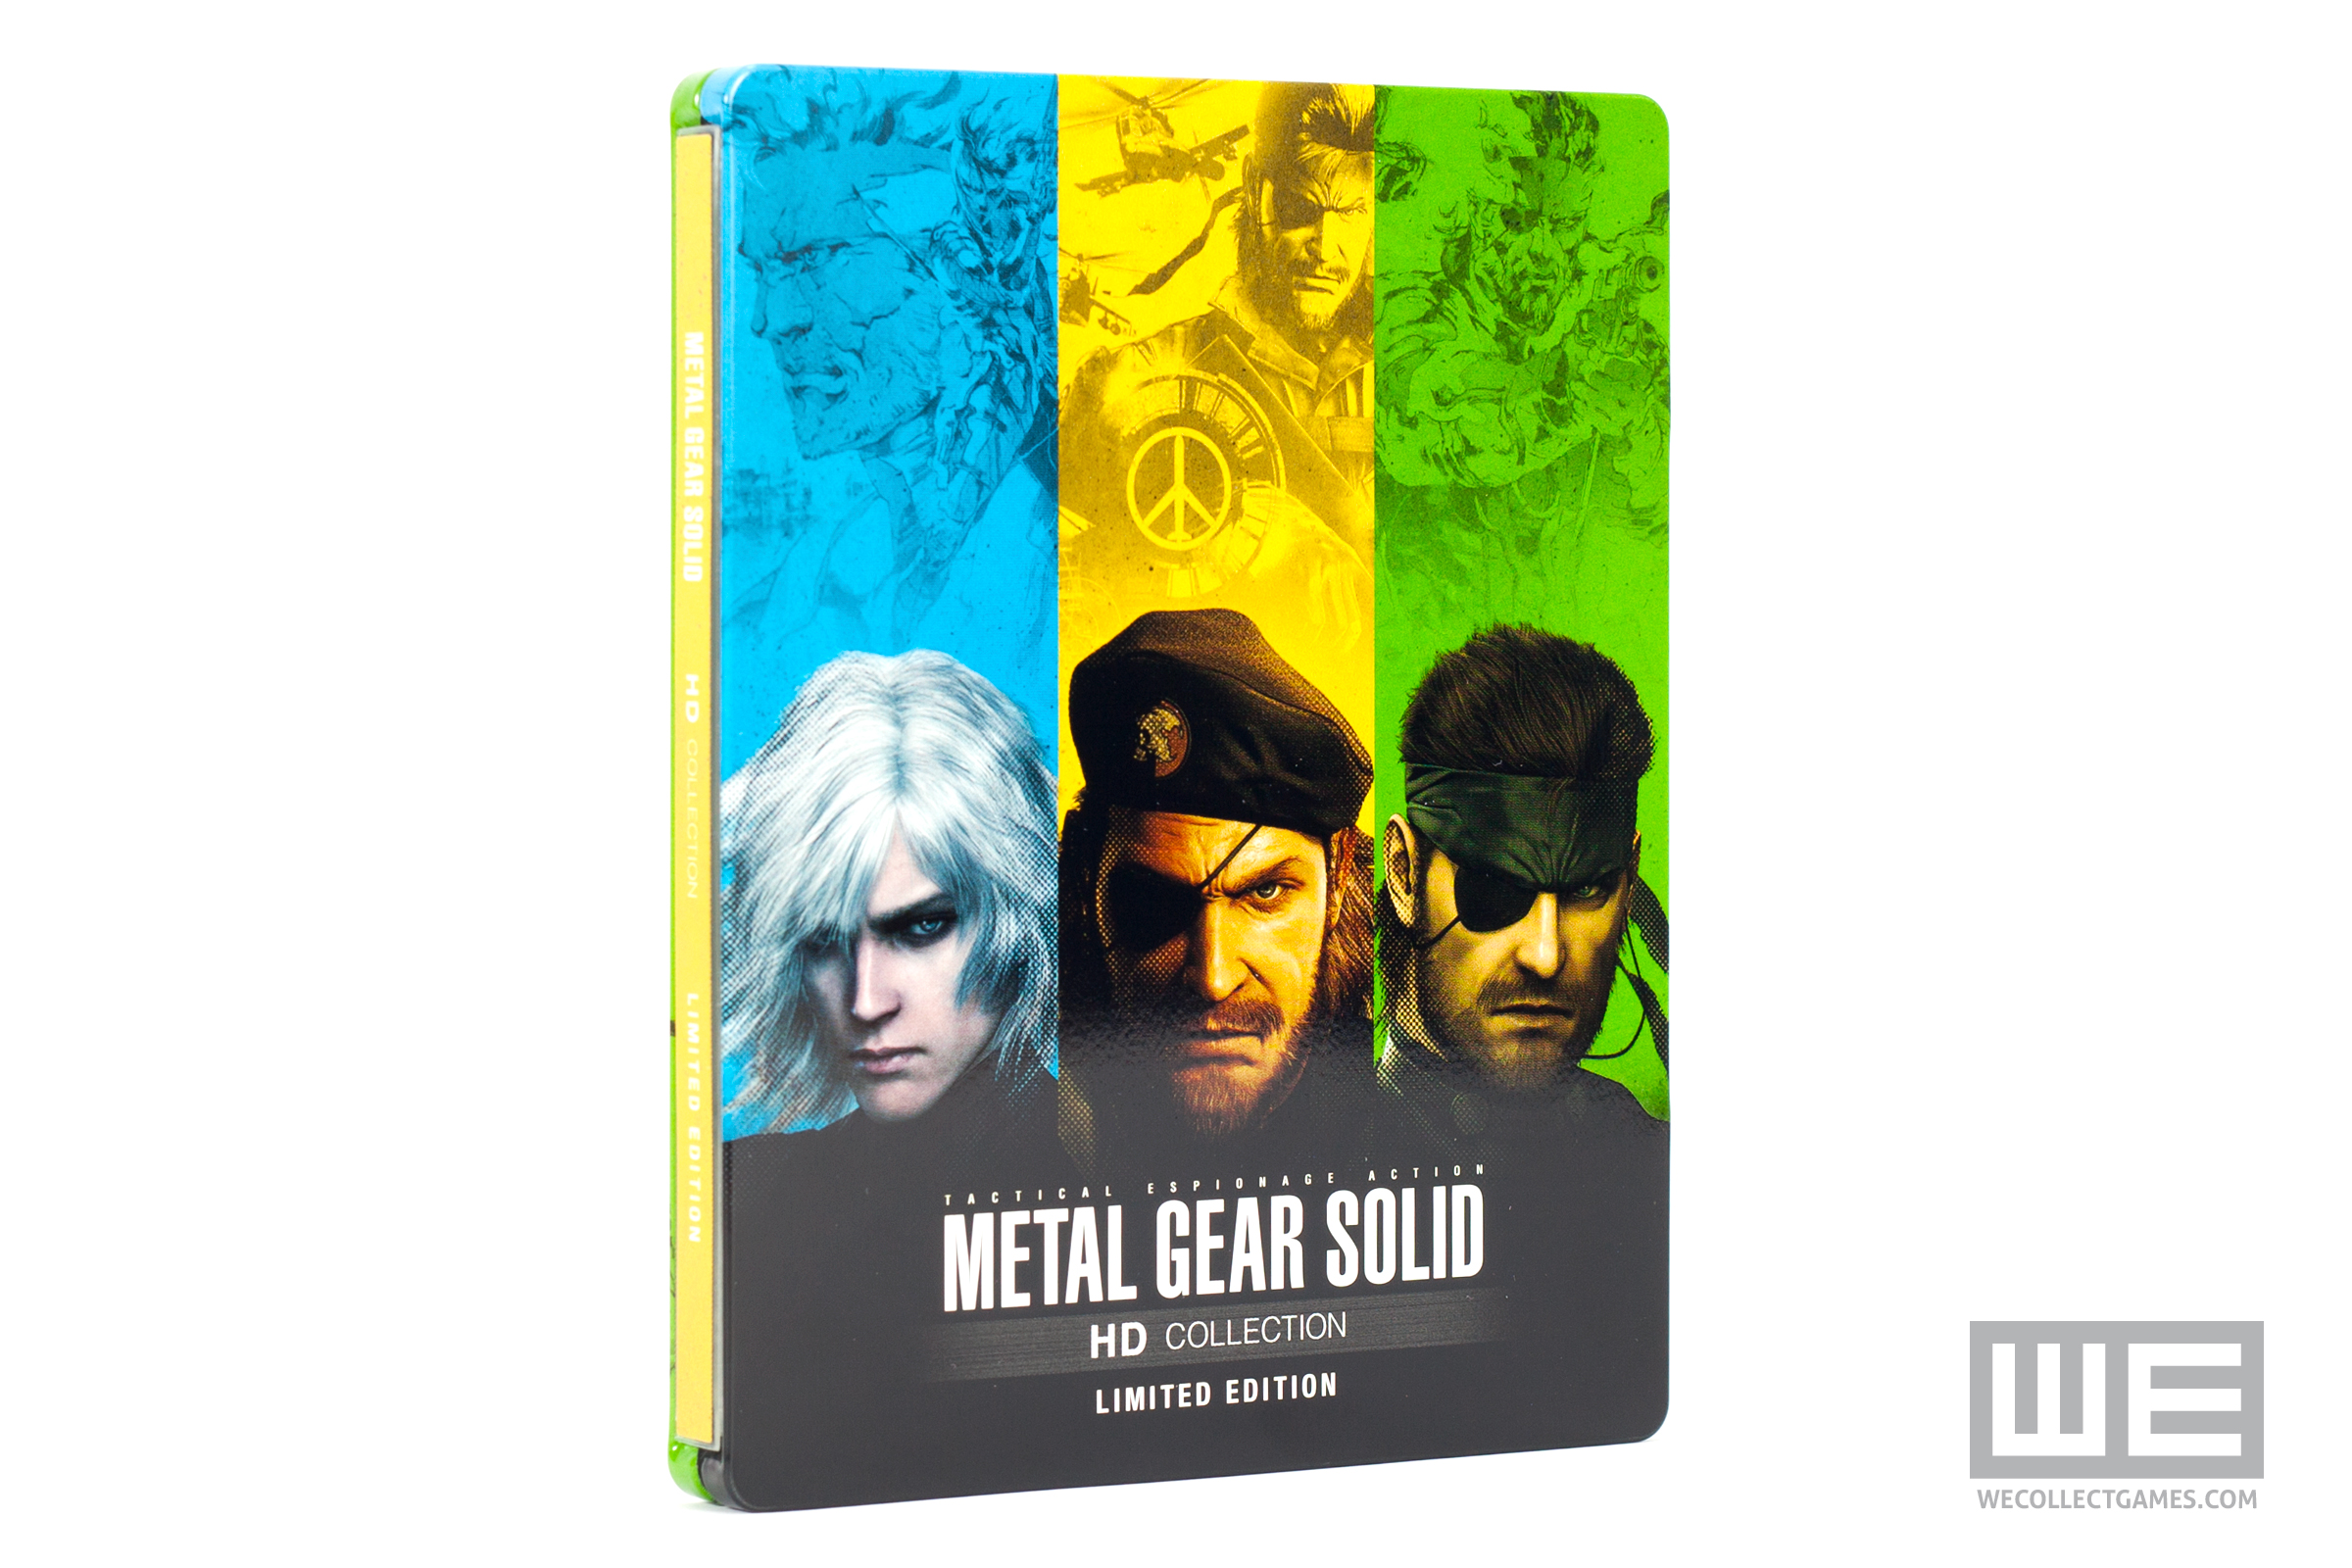 Metal Gear Solid HD Collection Steelbook